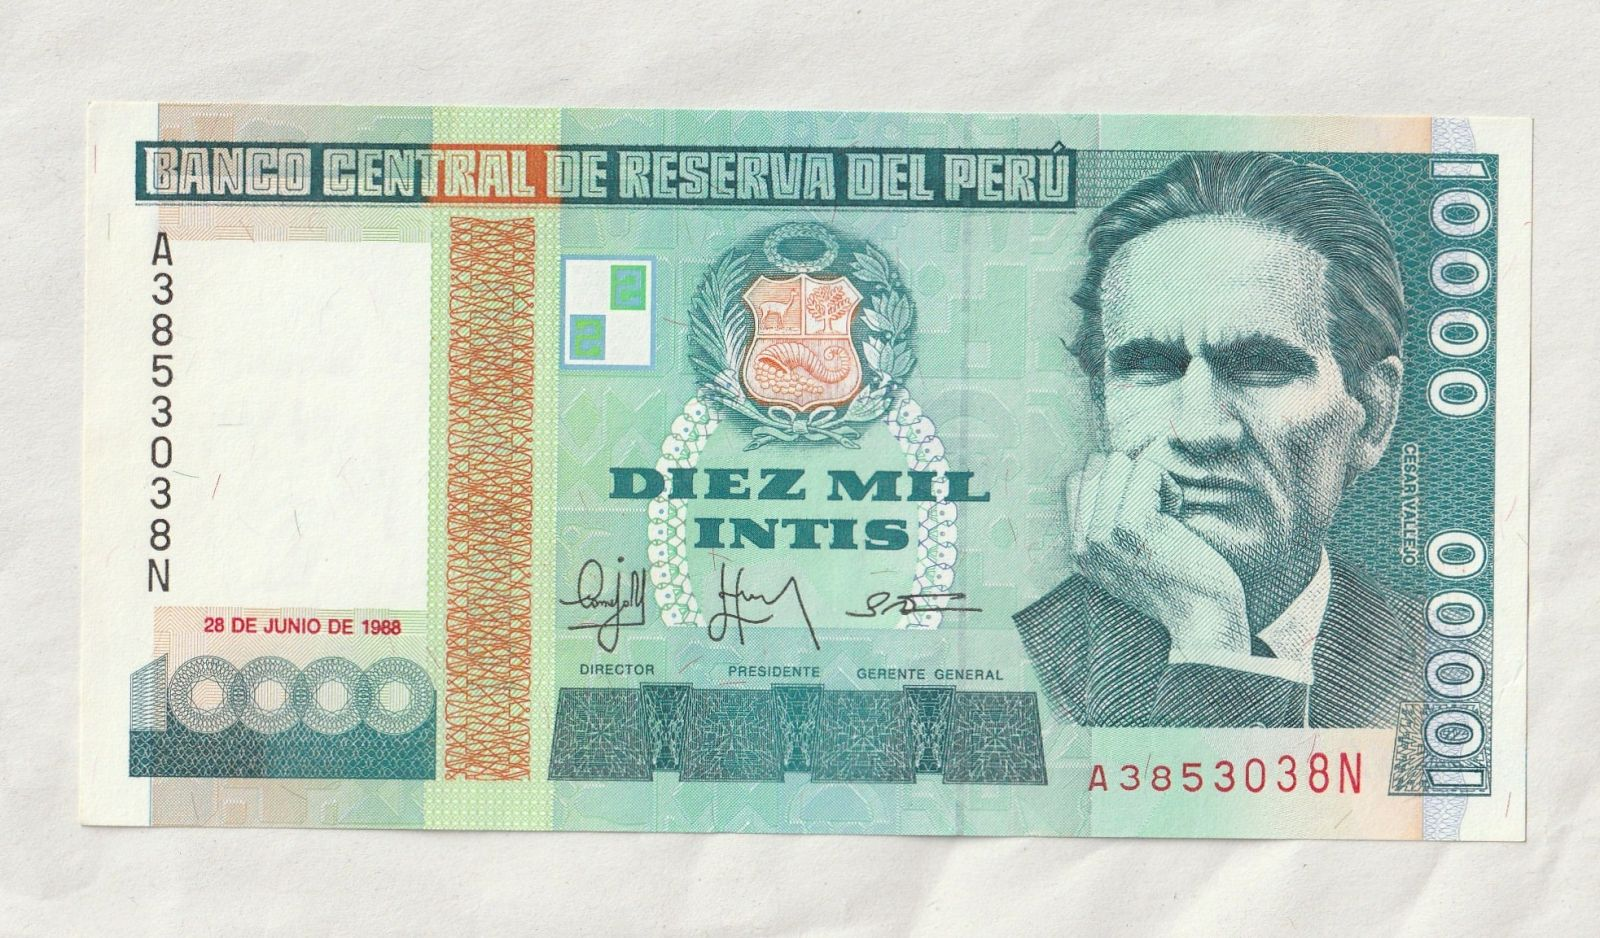 10000 Intis, 1988, Peru